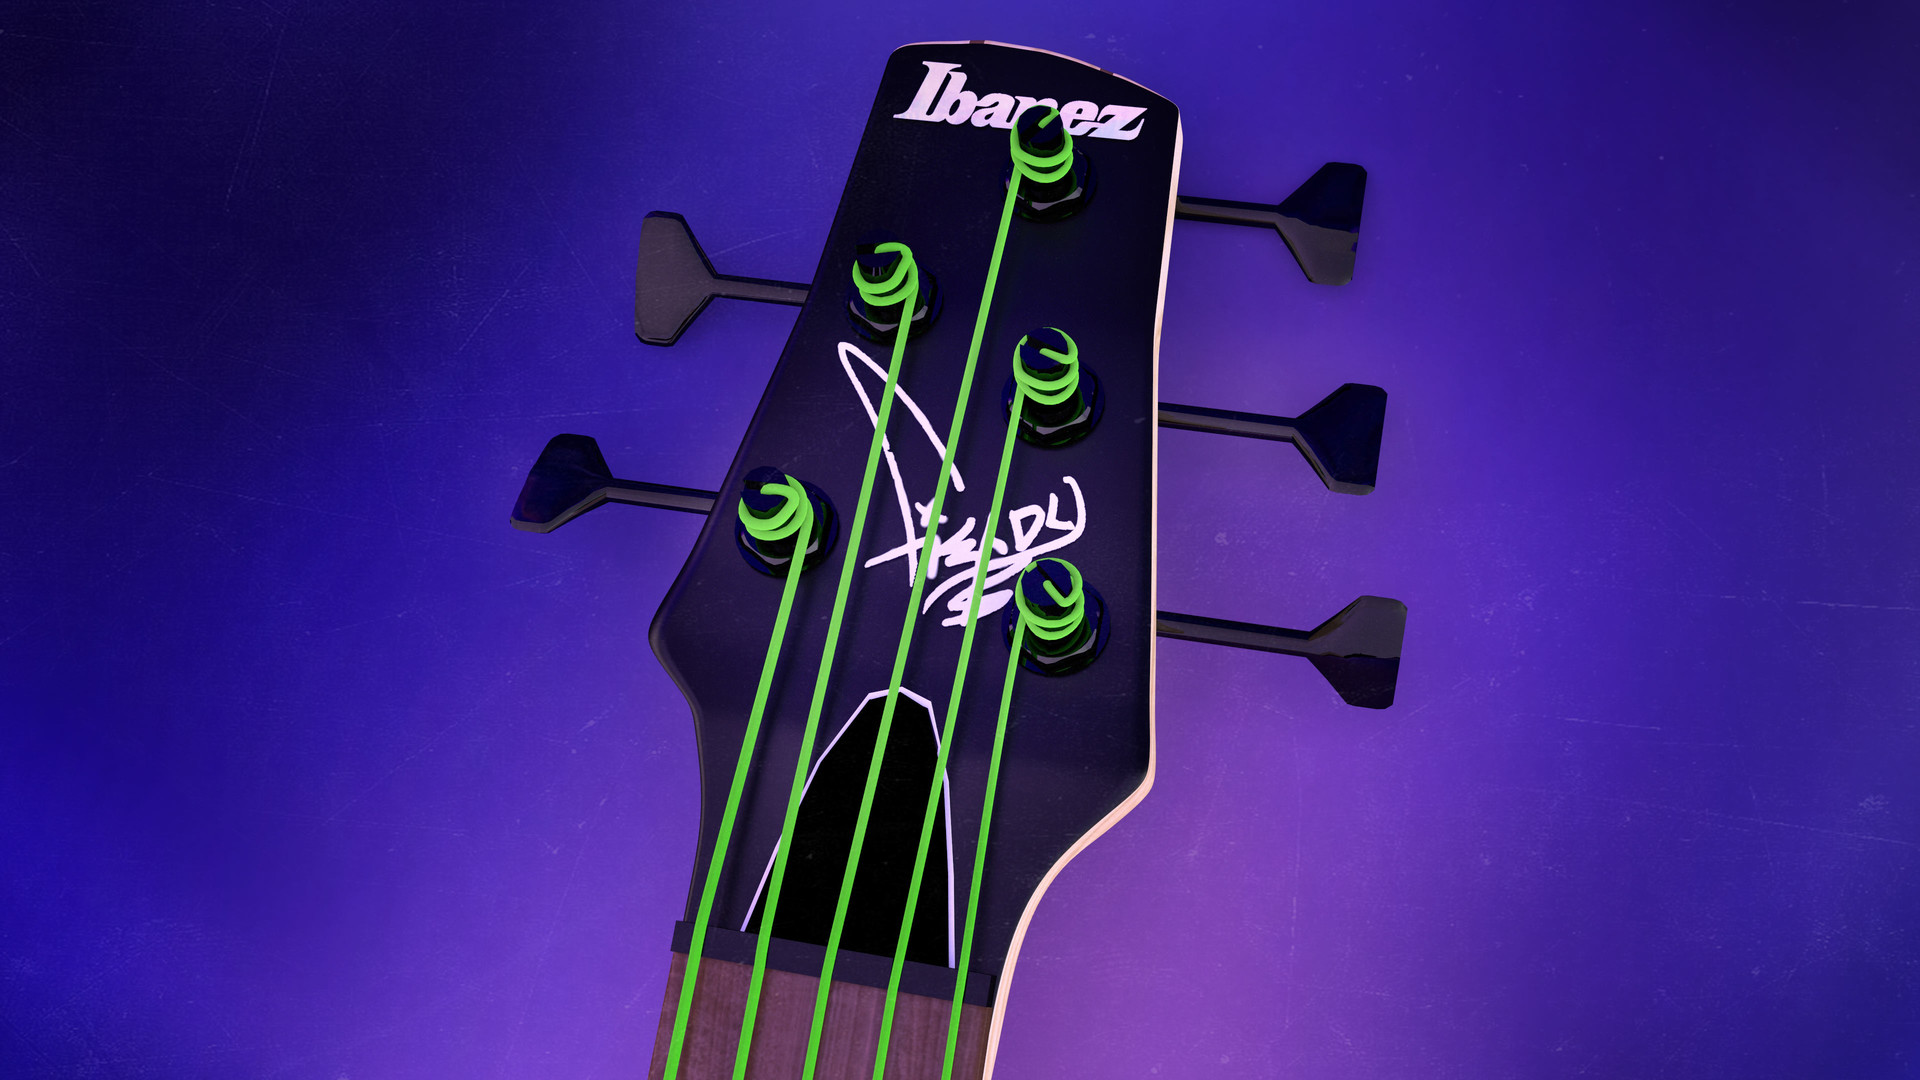 Sussi johansson bass33